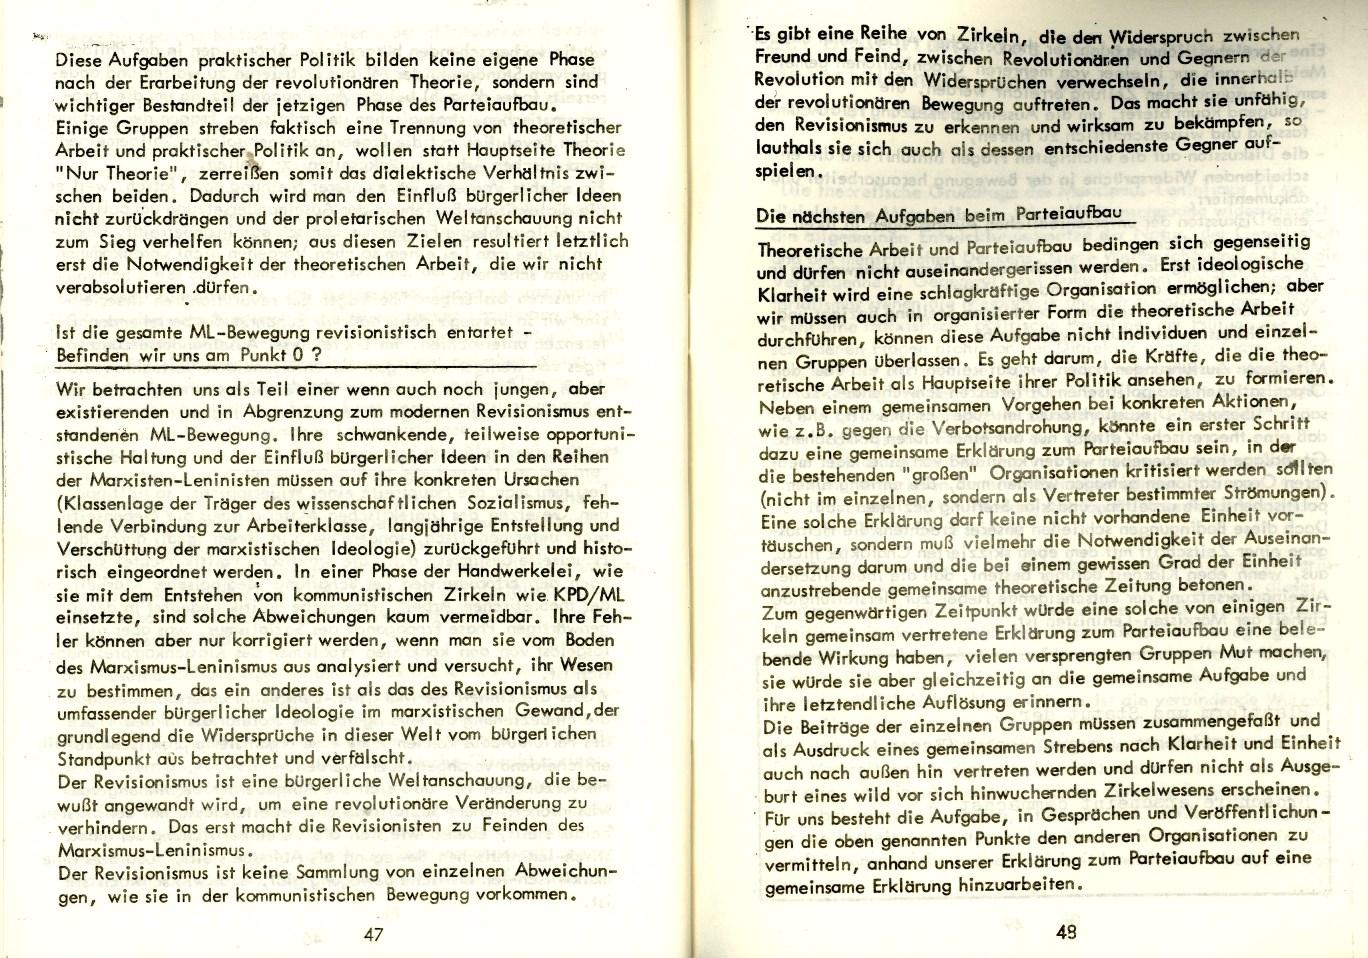 KGBE_1978_Resolutionen_25